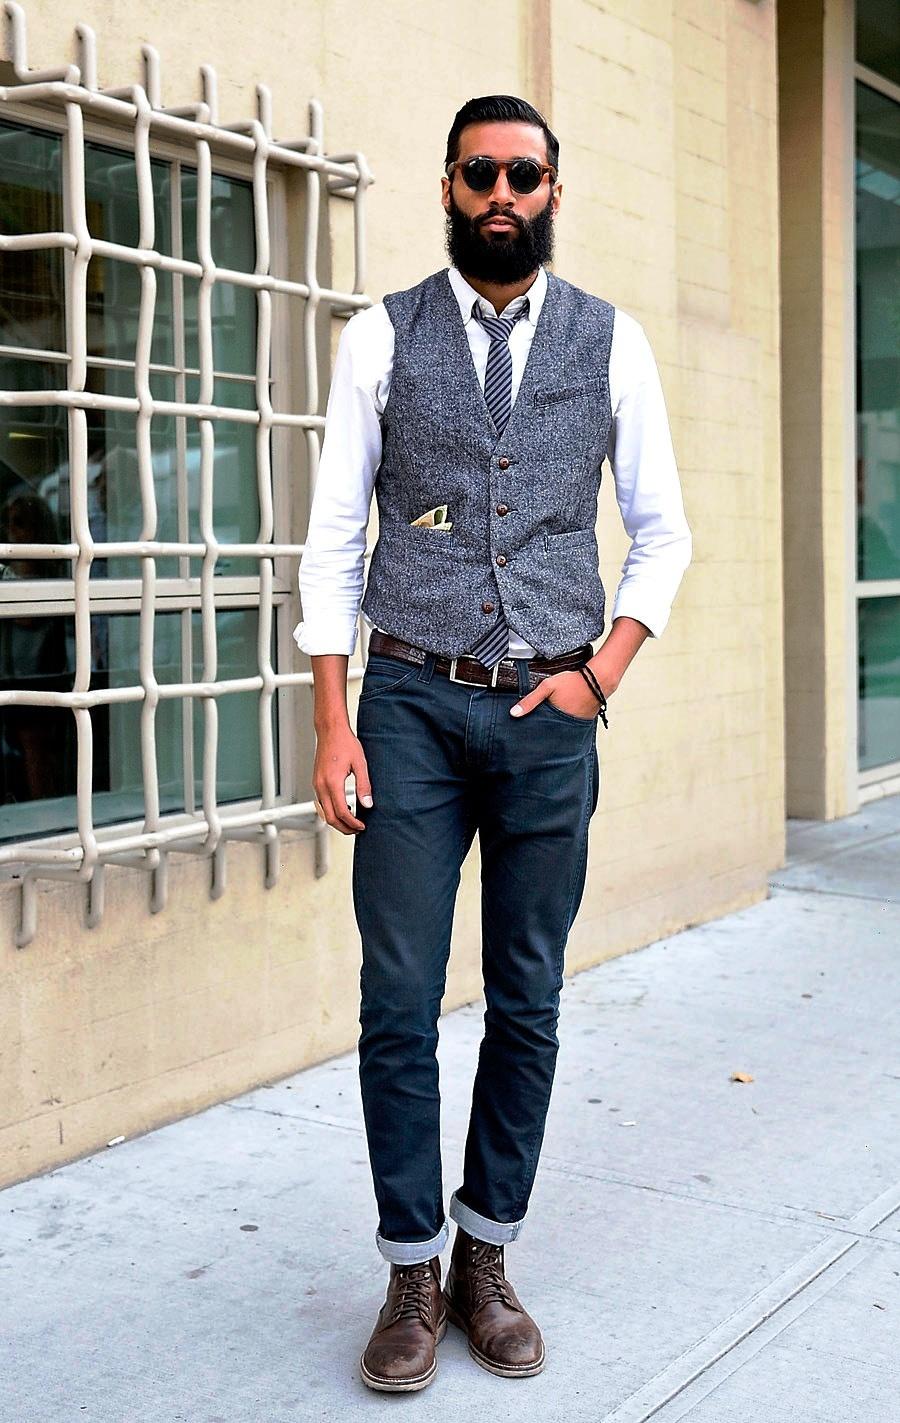 8-Party Wear For Men